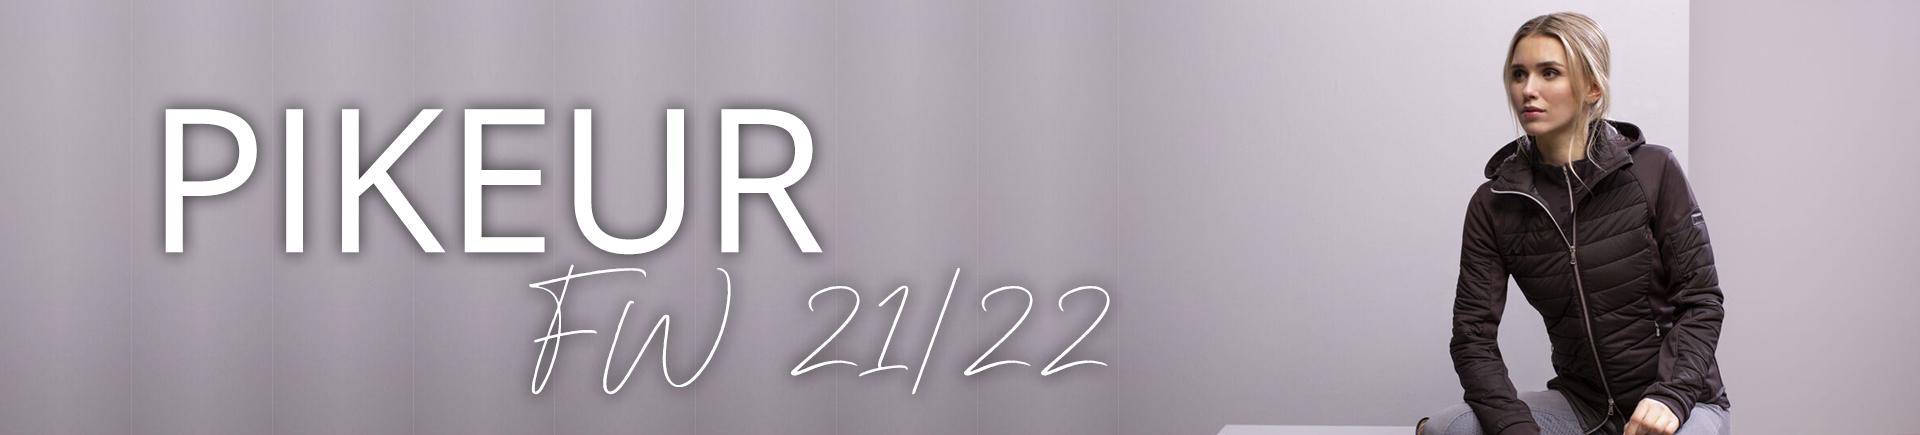 Pikeur FW 2021 wintercollectie